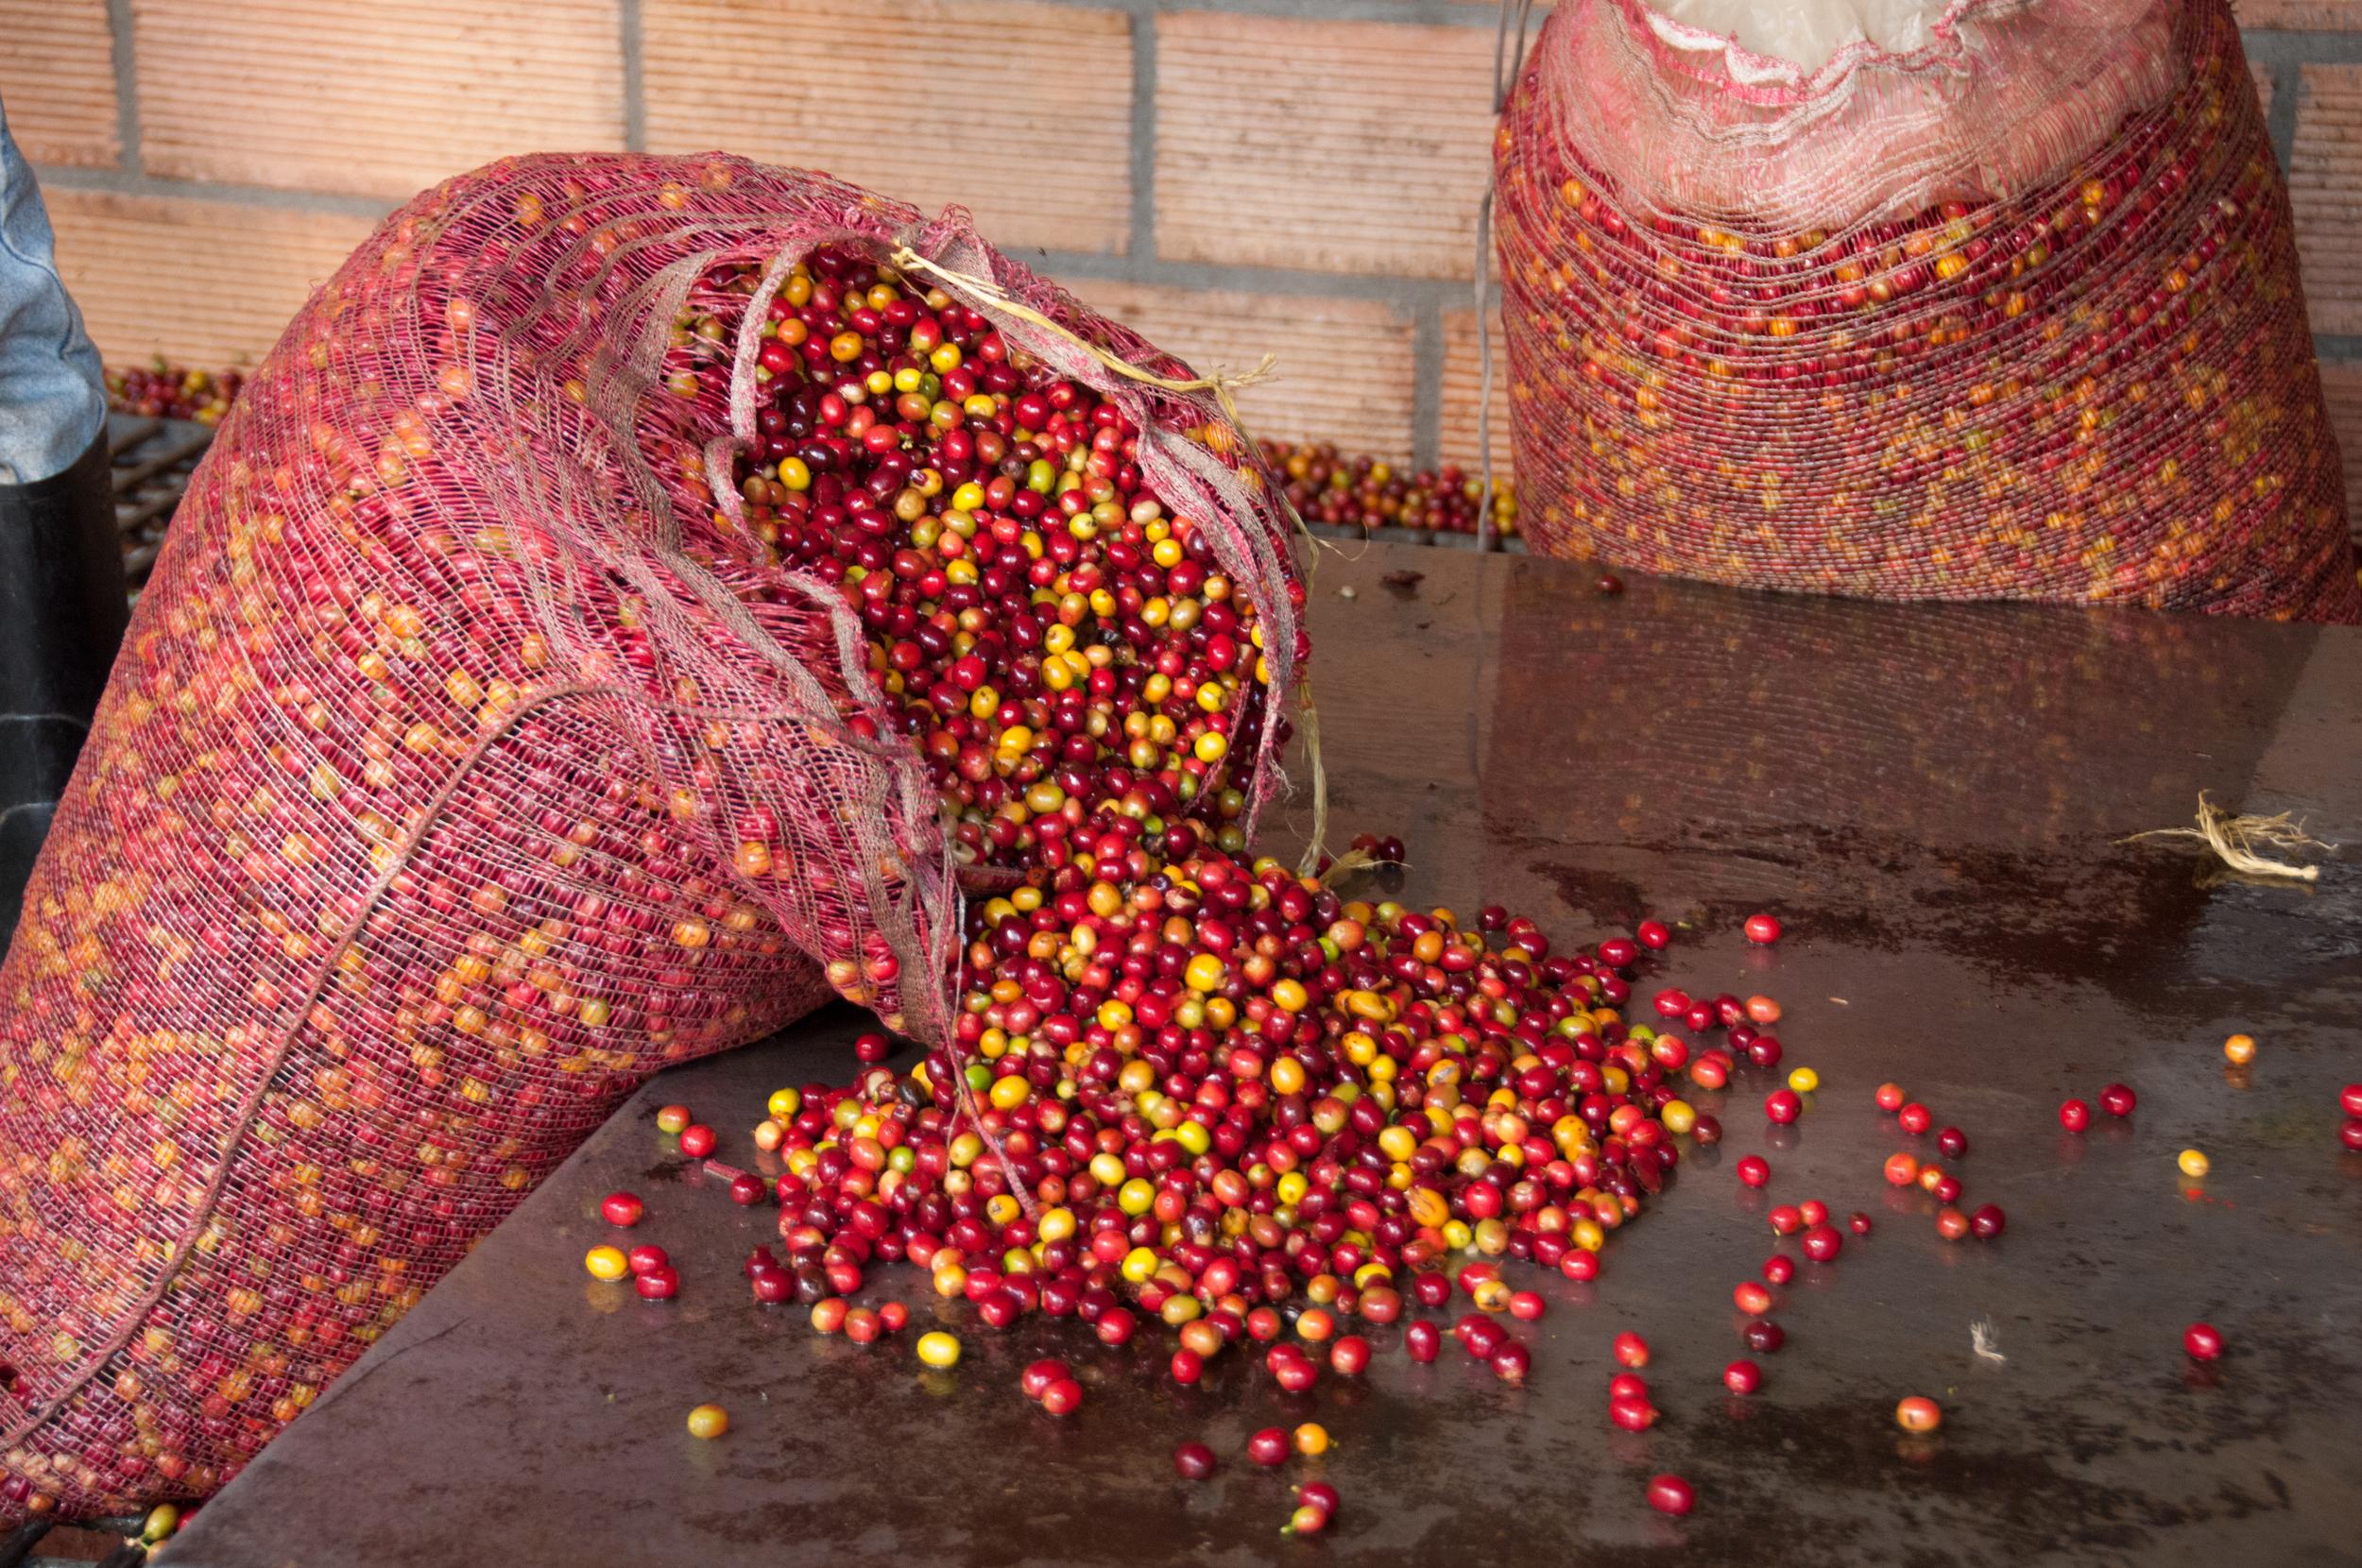 colombia coffee cherries